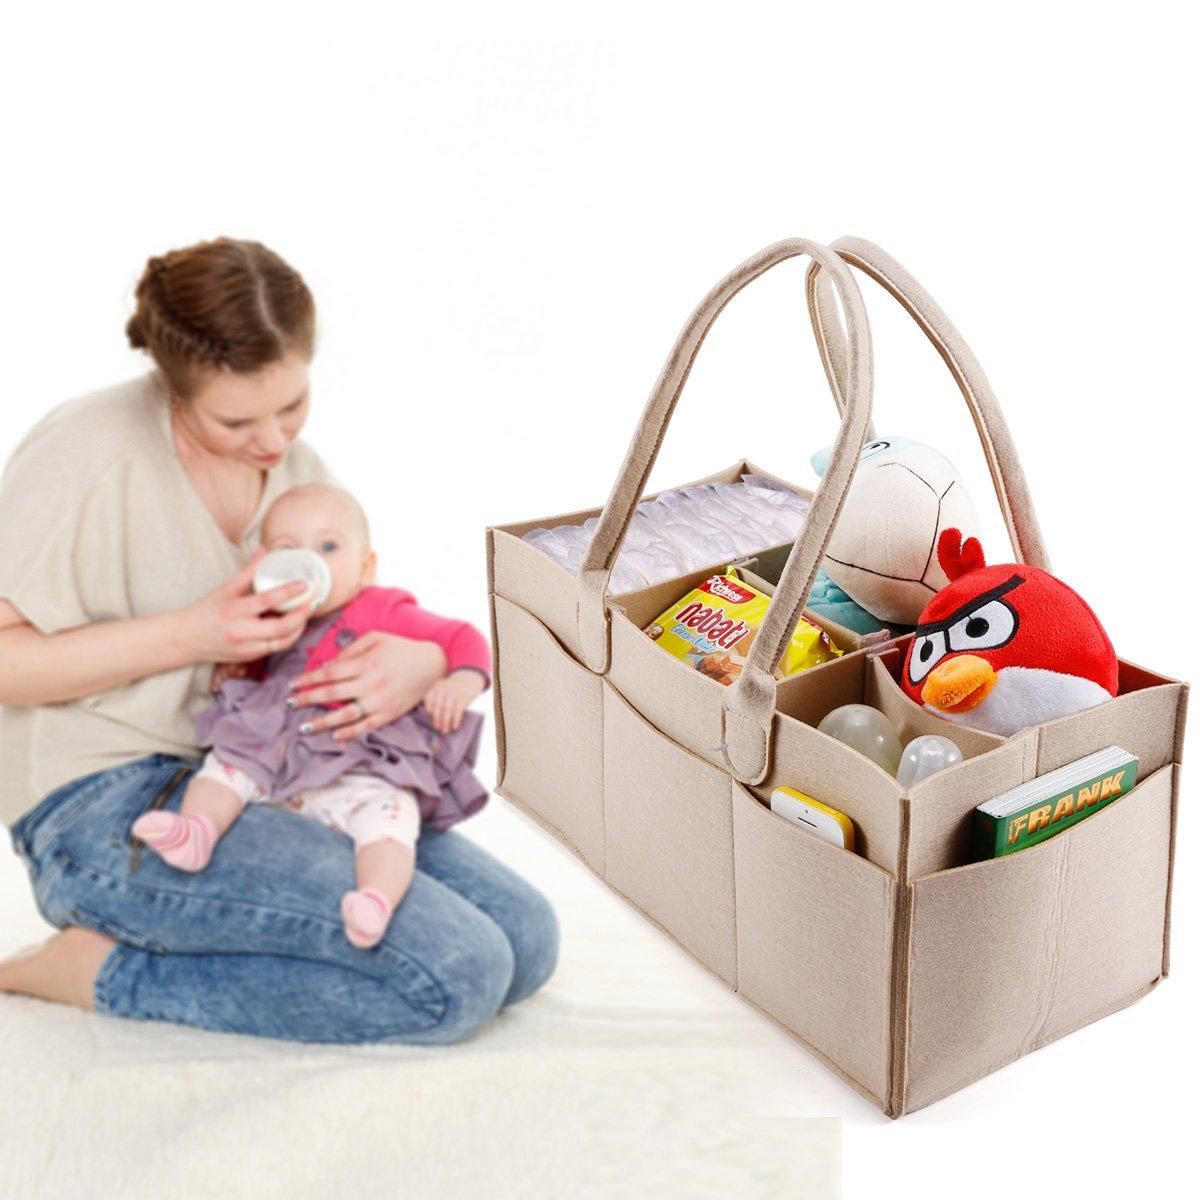 5 compartimentos Organizador de pañales bebé pañales bolsa de basura de almacenamiento Caddy, guardería Bebé Toallitas cesta: Amazon.es: Hogar